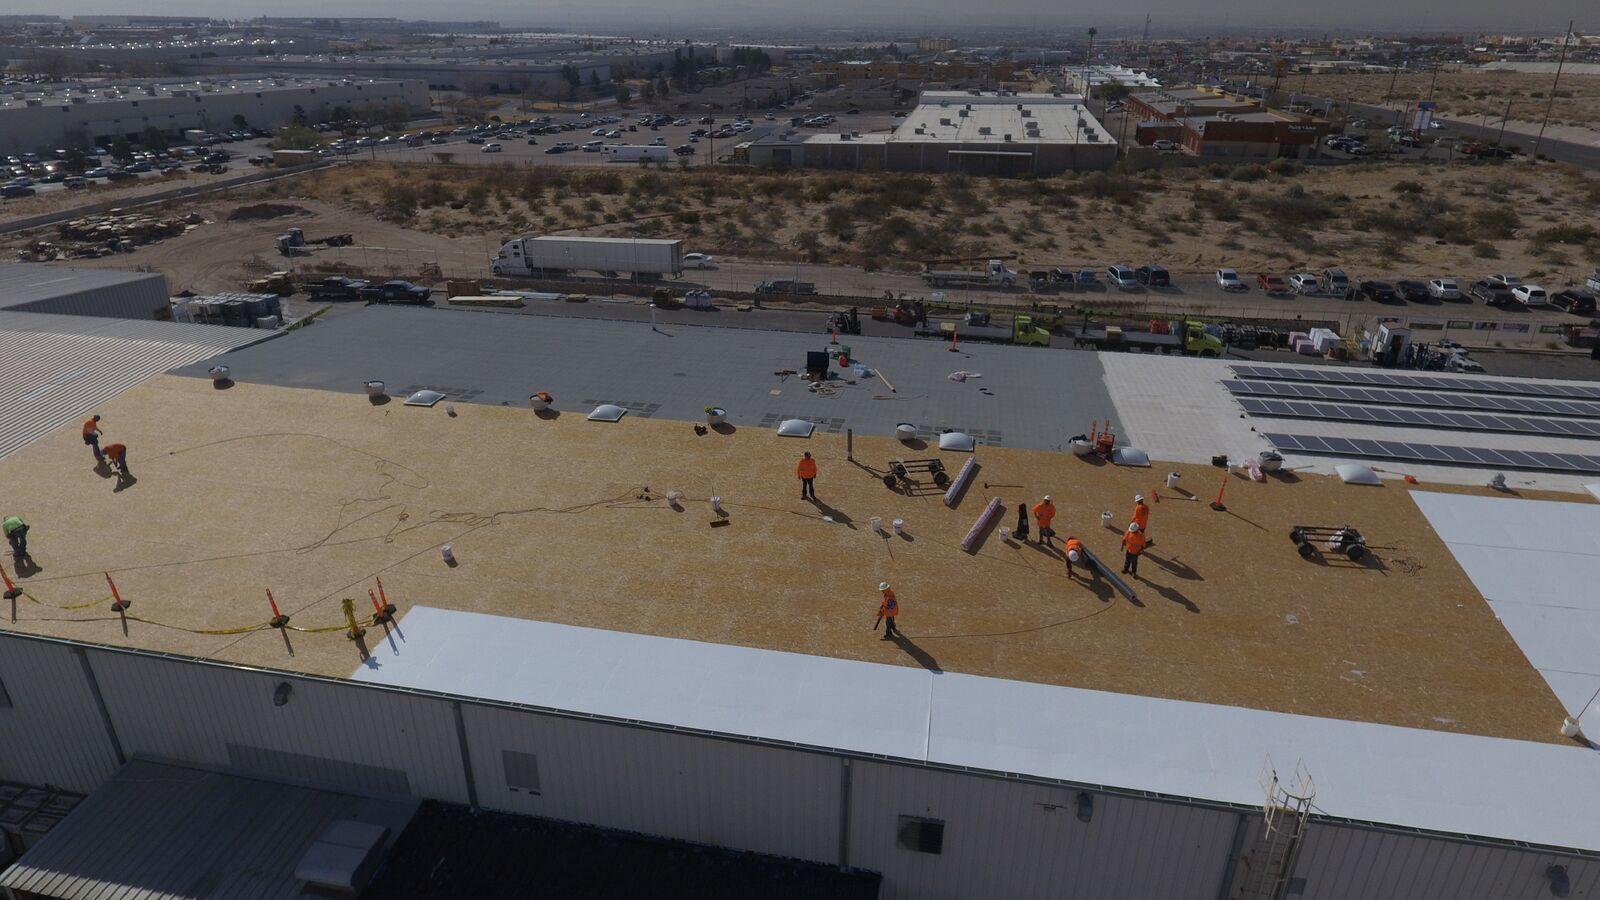 Professional Roofers & Contractors image 3